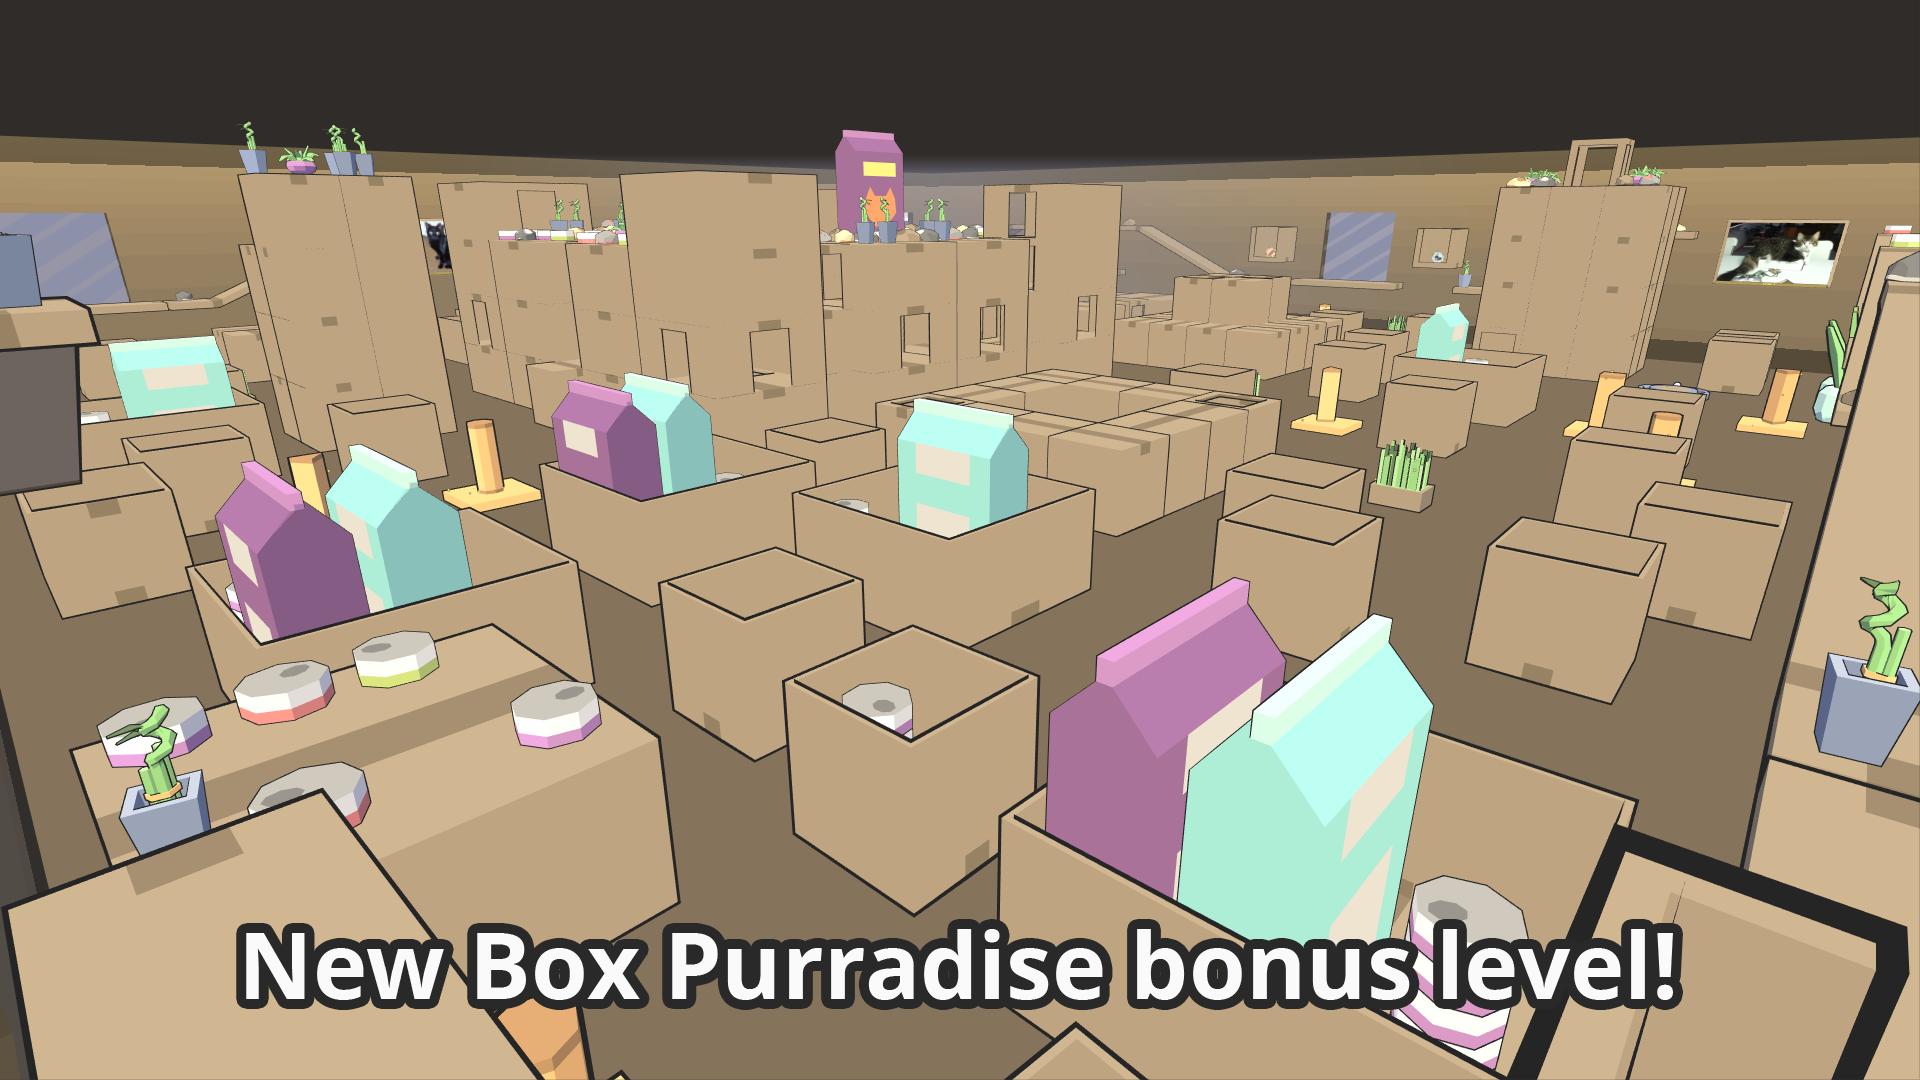 Box Purradise